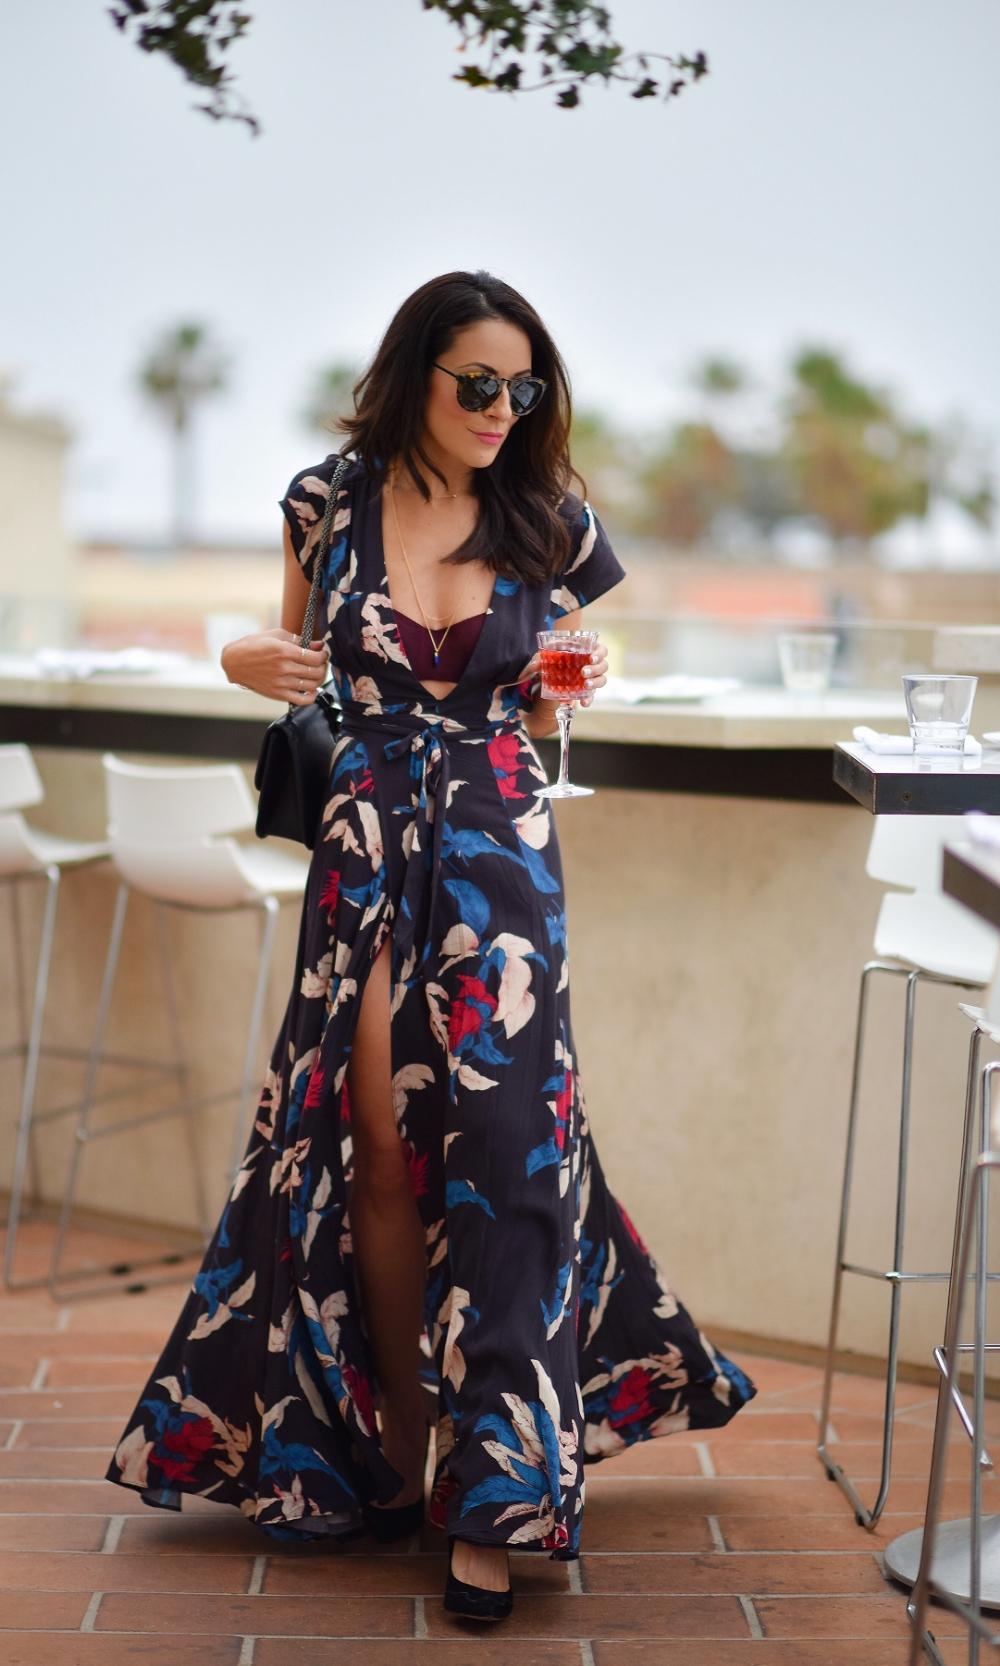 TularosaLabel_MaxiDress_LaPlazaLajolla_AzzurraCapri_LucysWhims_FashionBlogger_Catania.jpg